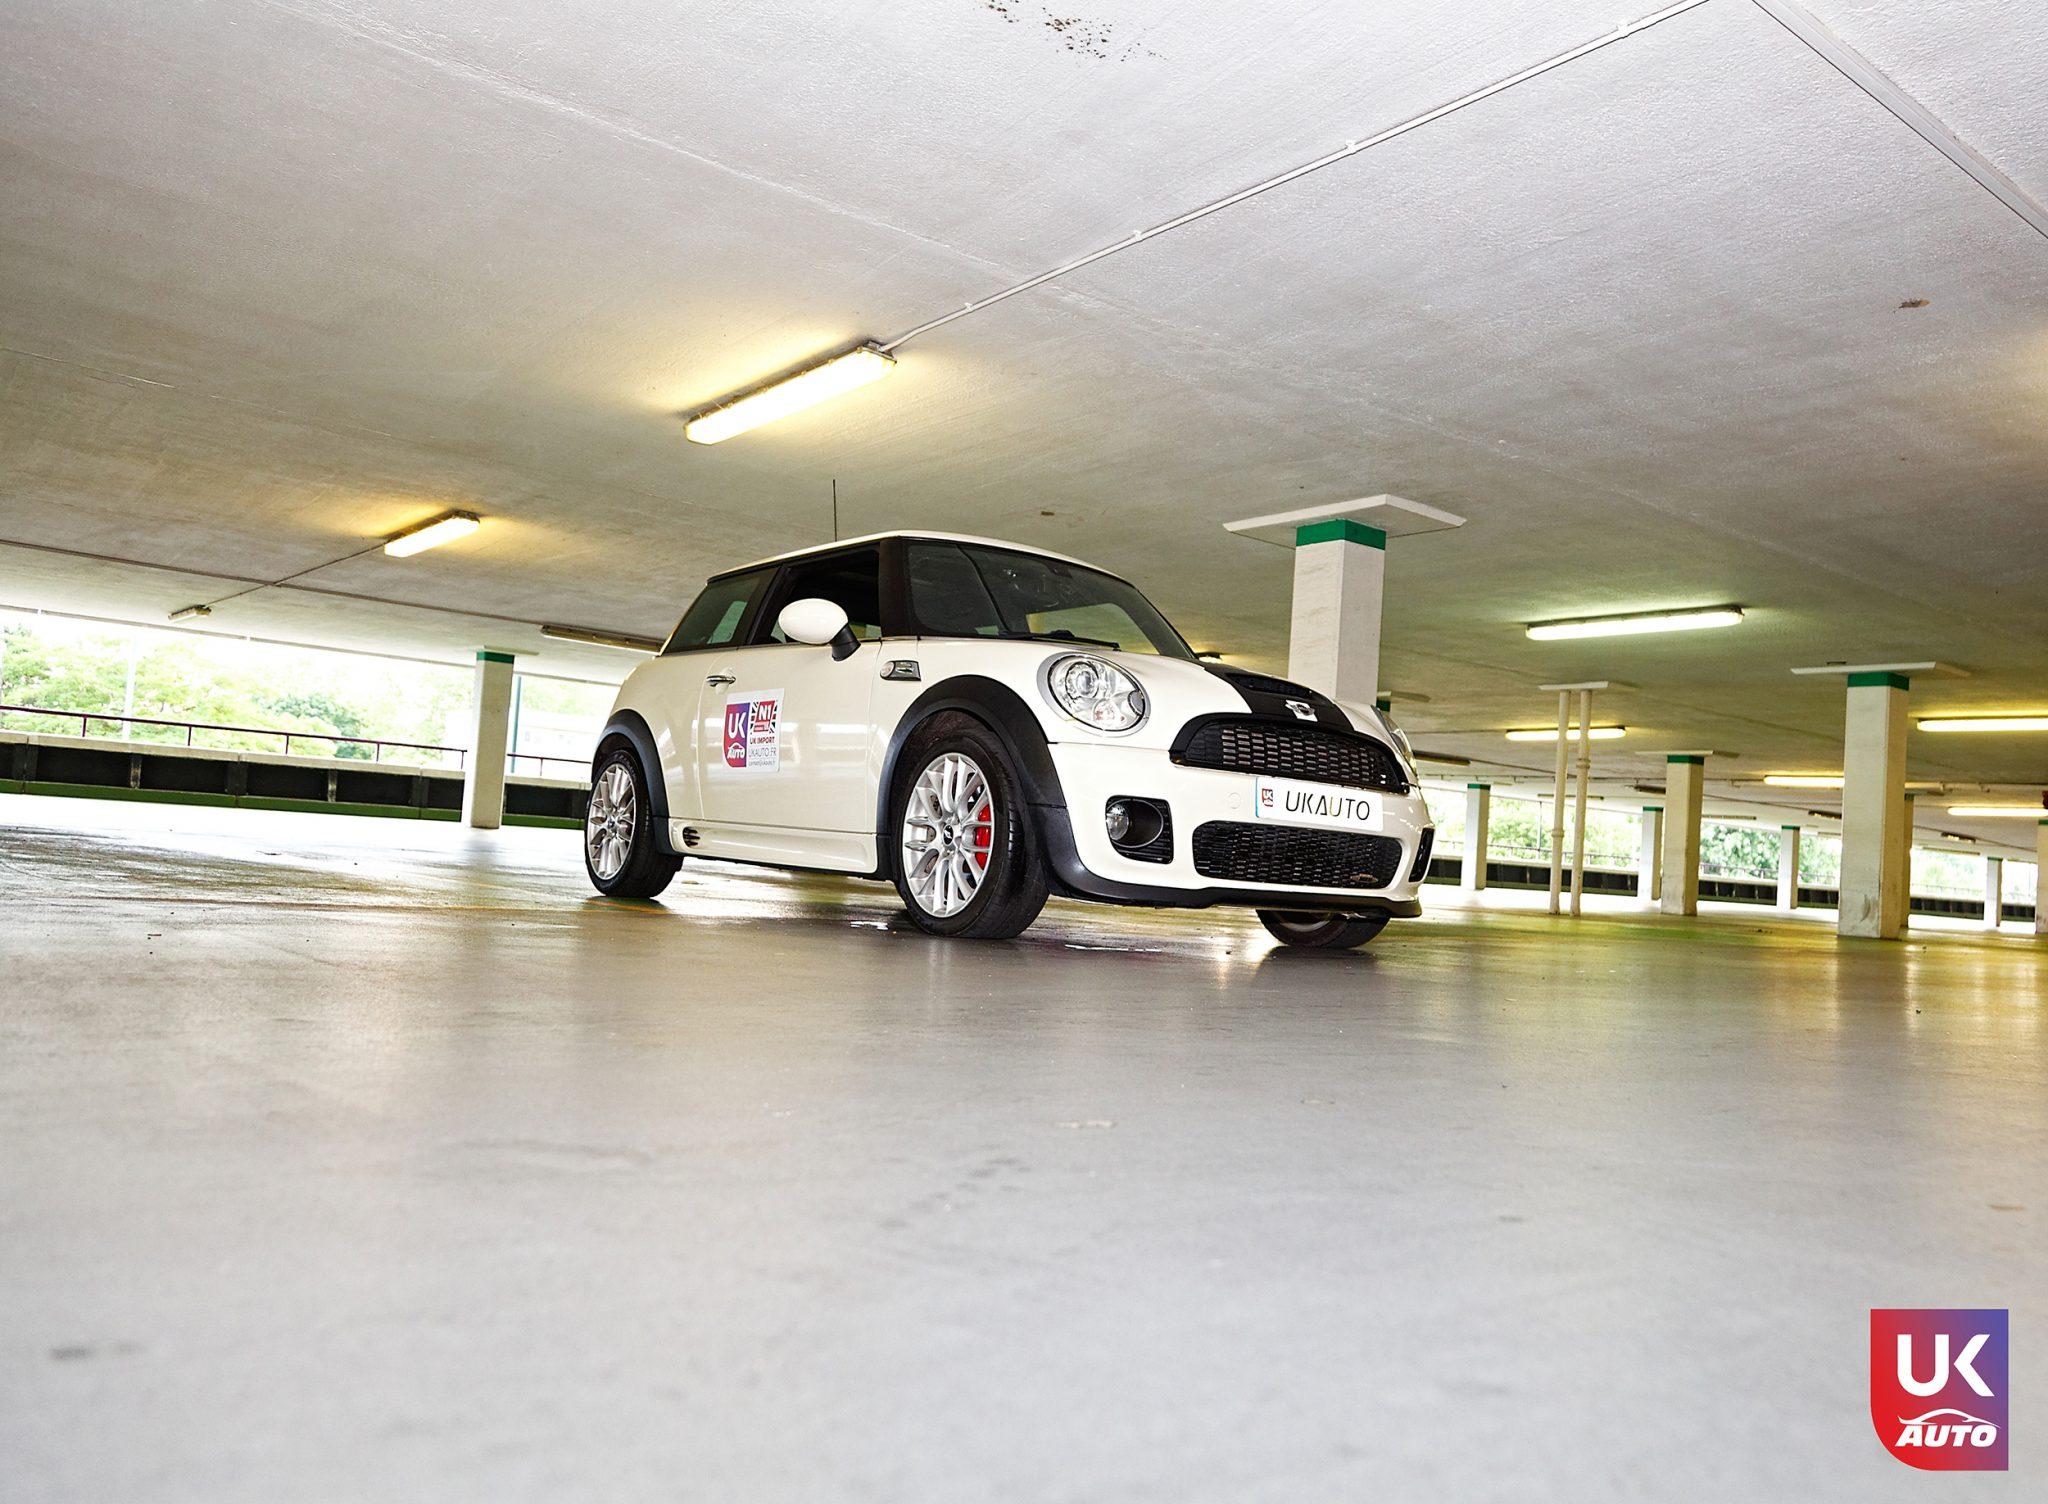 uk mini angleterre mini cooper jcw john cooper works importation angleterre voiture occasion angleterre12 - Felicitation a Antoine Mini Cooper JCW John Cooper Works R56 voiture d'occasion en Angleterre